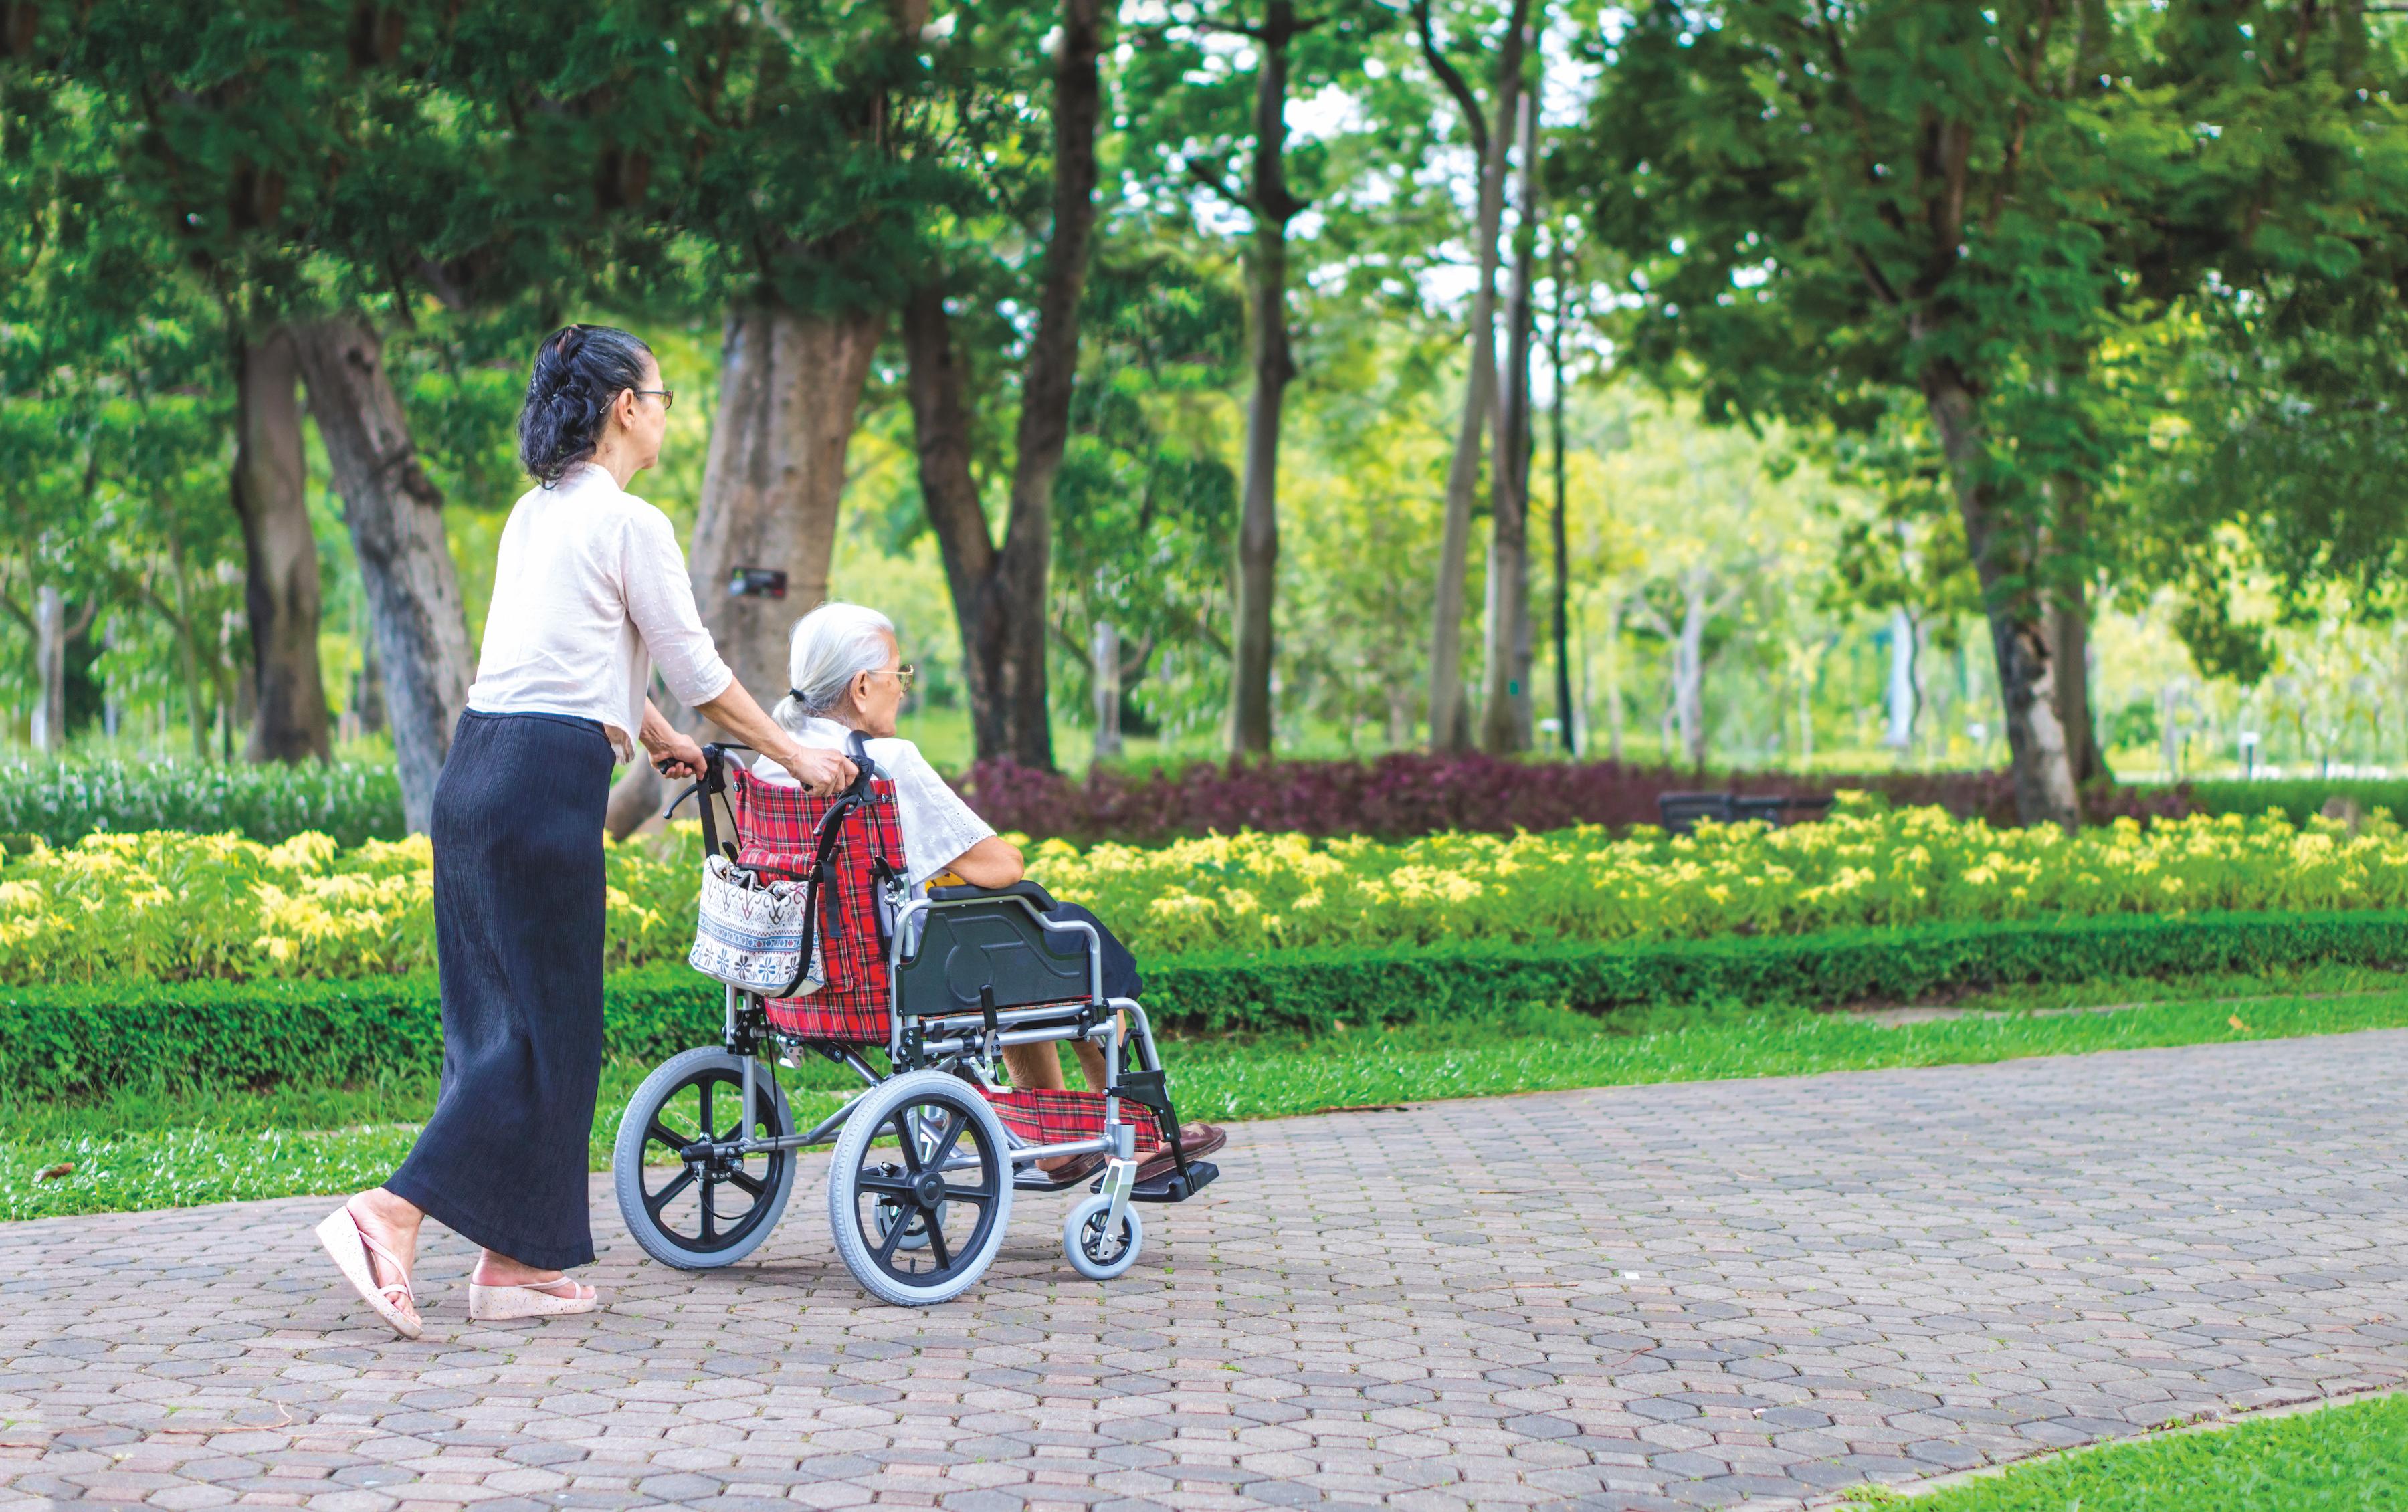 A woman pushing an elderly woman in a wheelchair